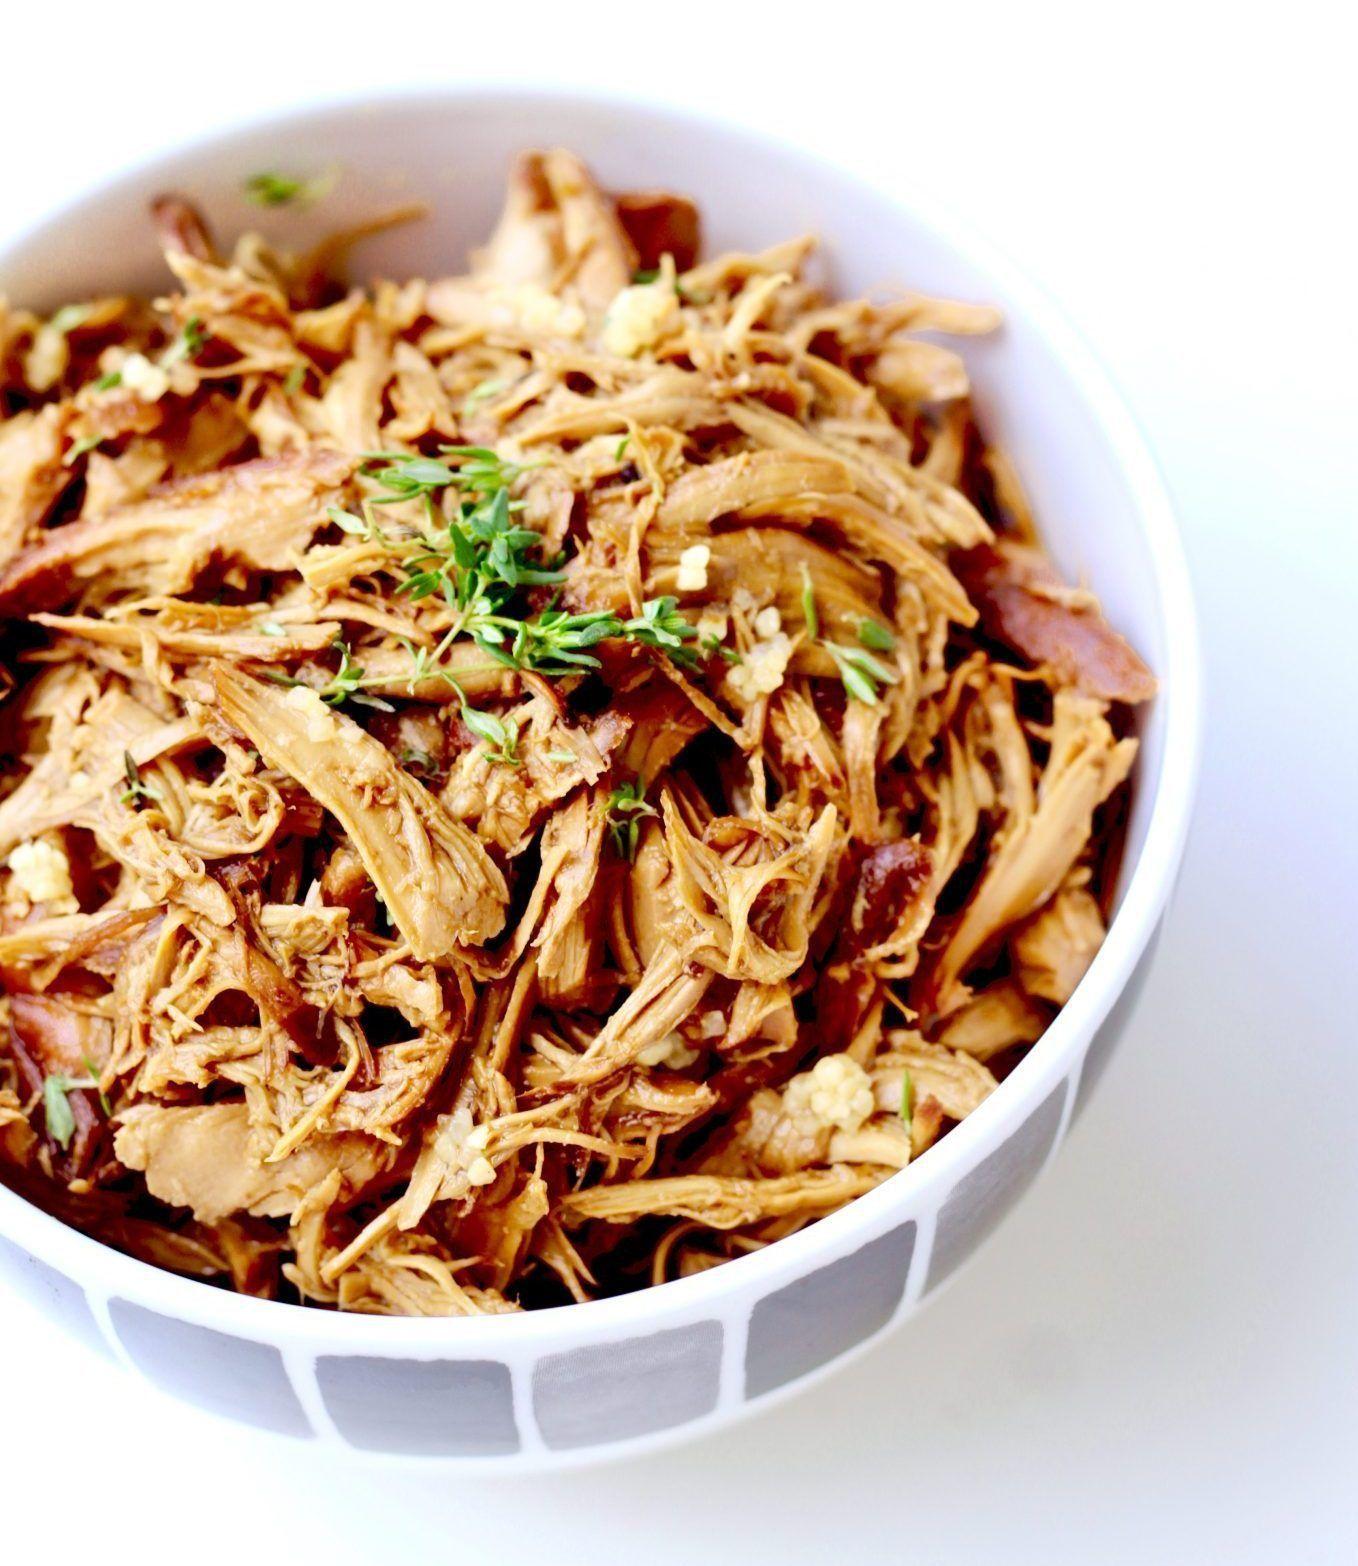 Simple Chicken Crock Pot Recipes Healthy: 5 Ingredient Crock Pot Honey Garlic Chicken